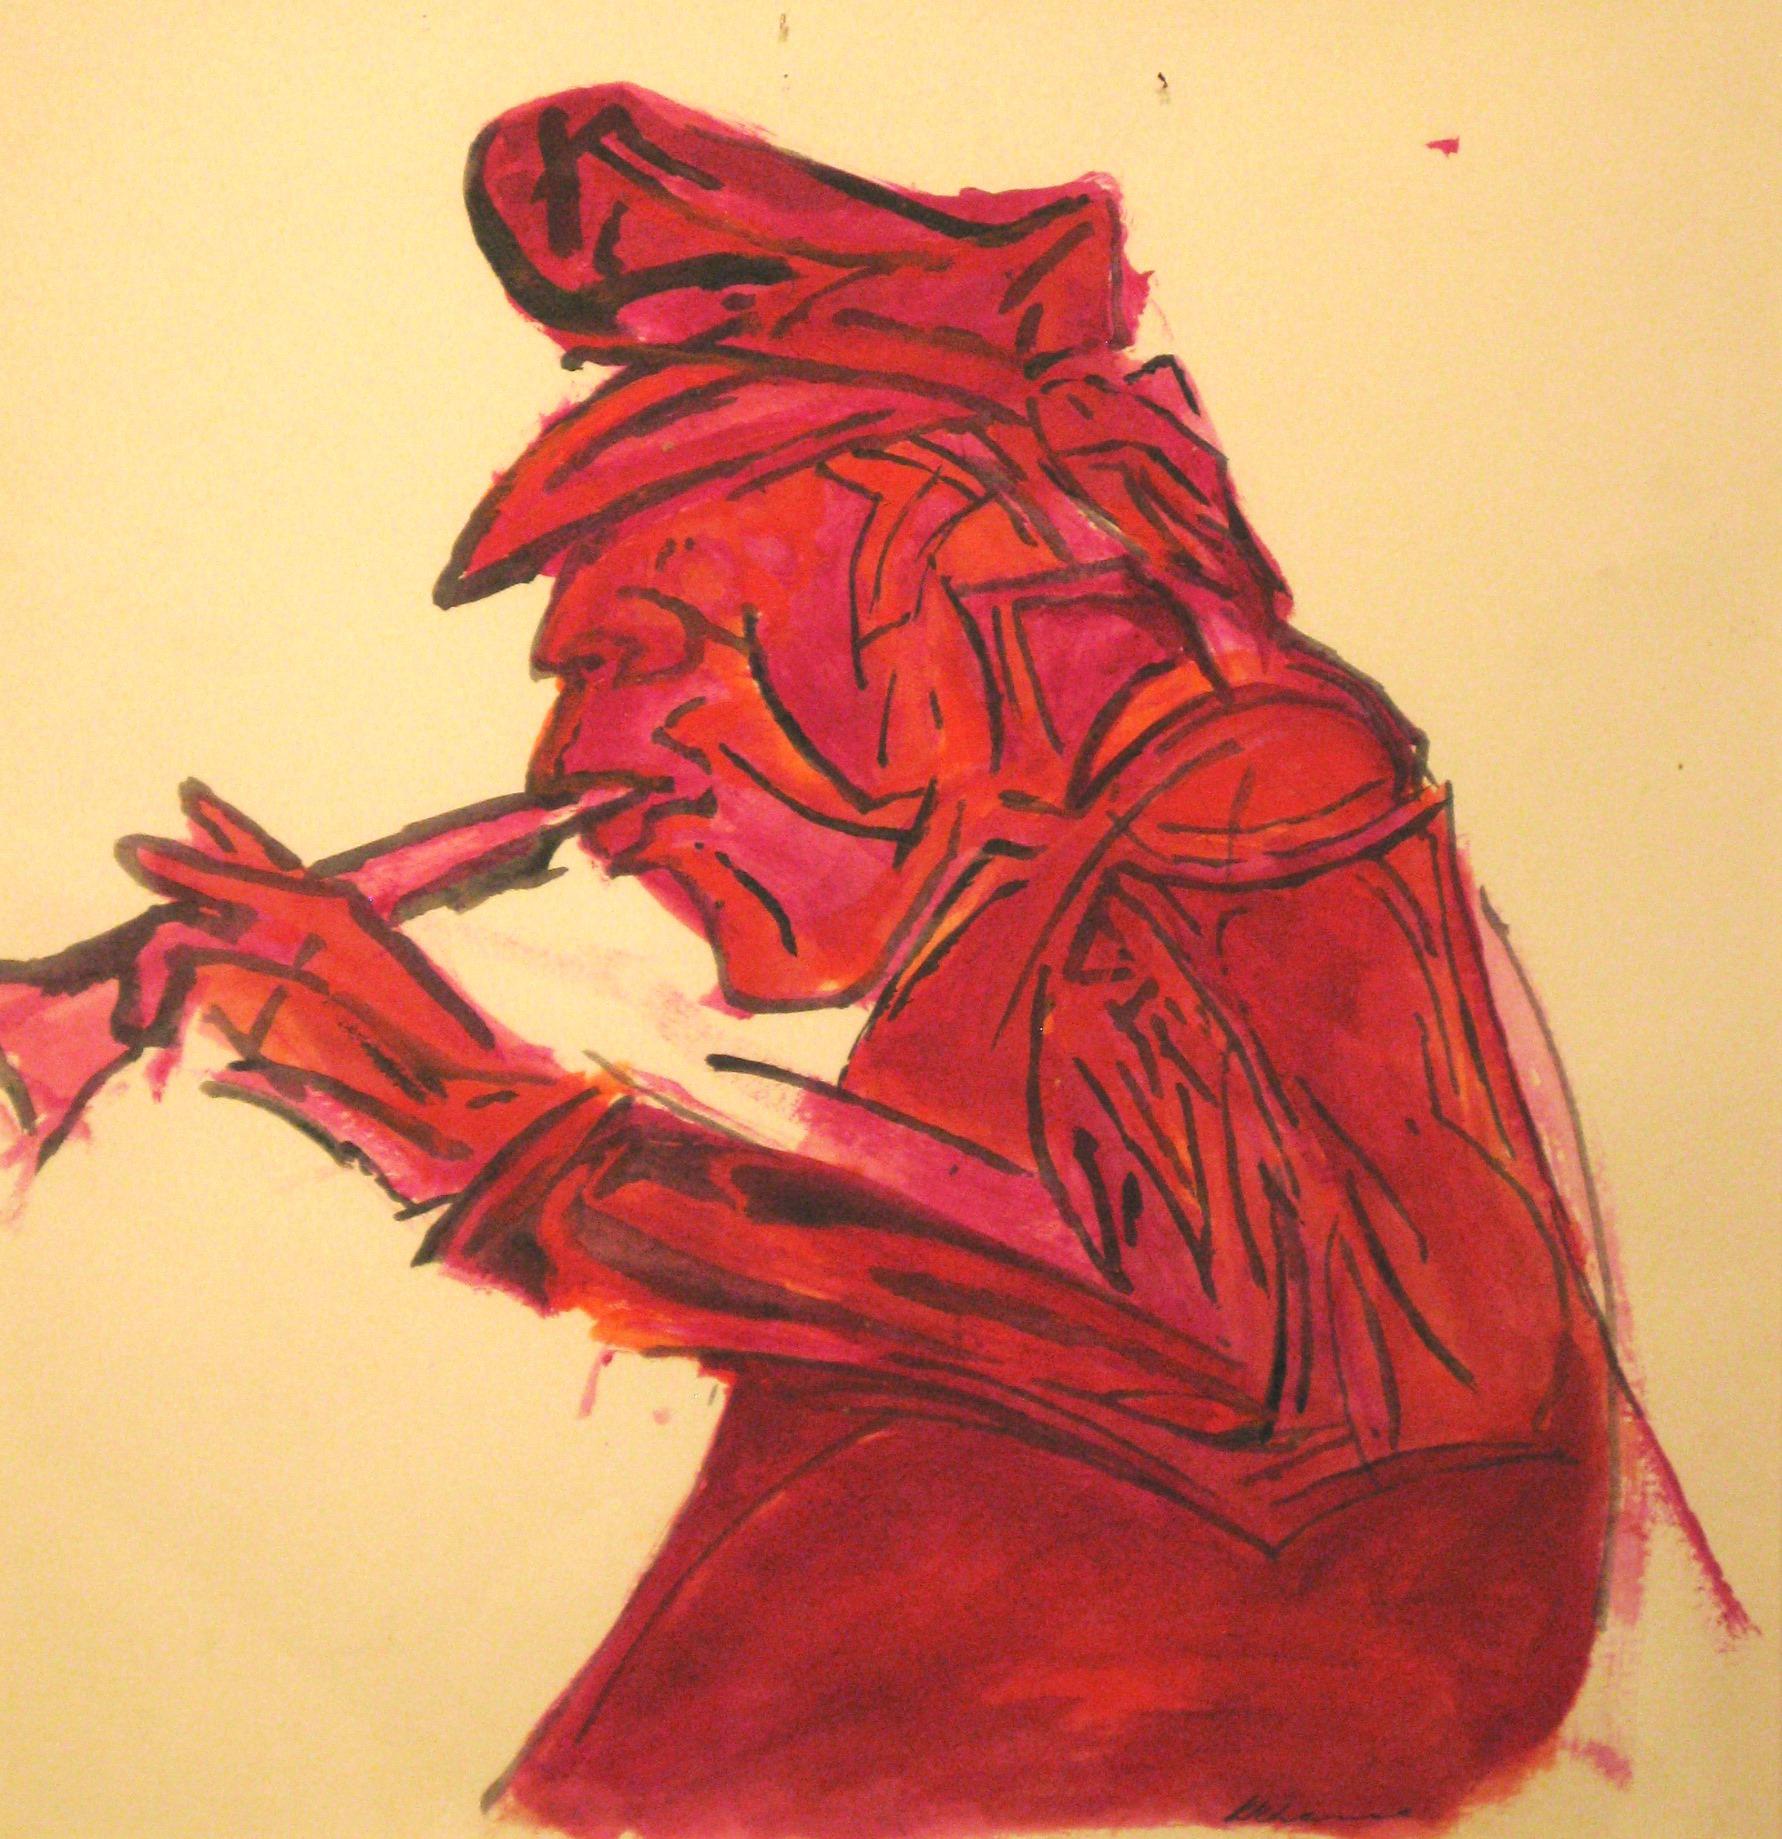 Bandwalla. Watercolour on paper 20 x 20cm (8 x 8 in.)